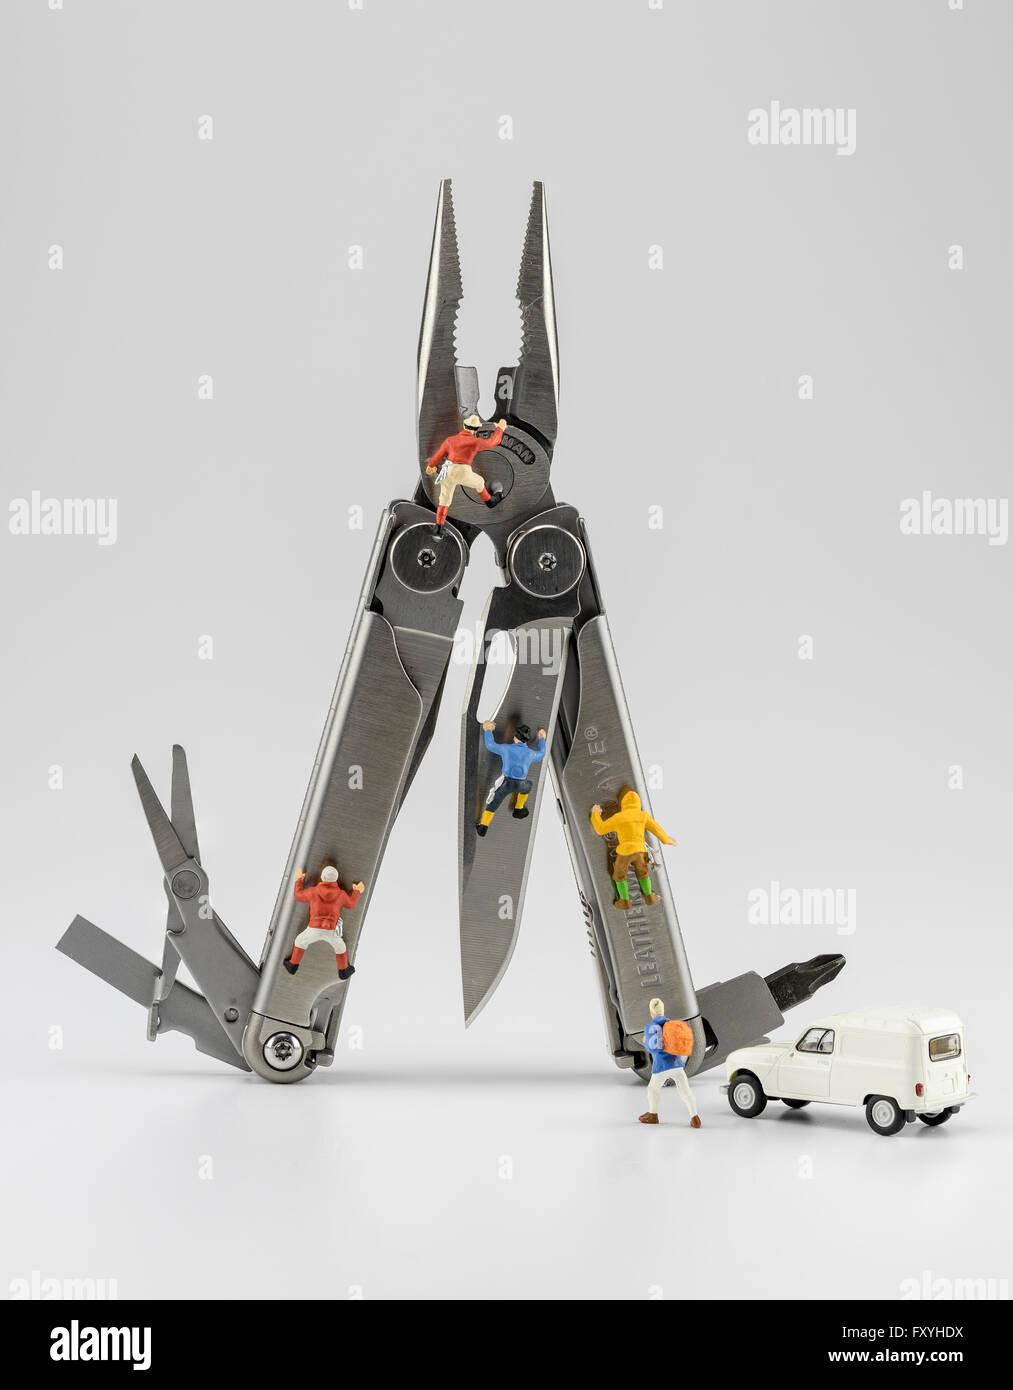 Leatherman tool, multitool with mountaineer figures - Stock Image